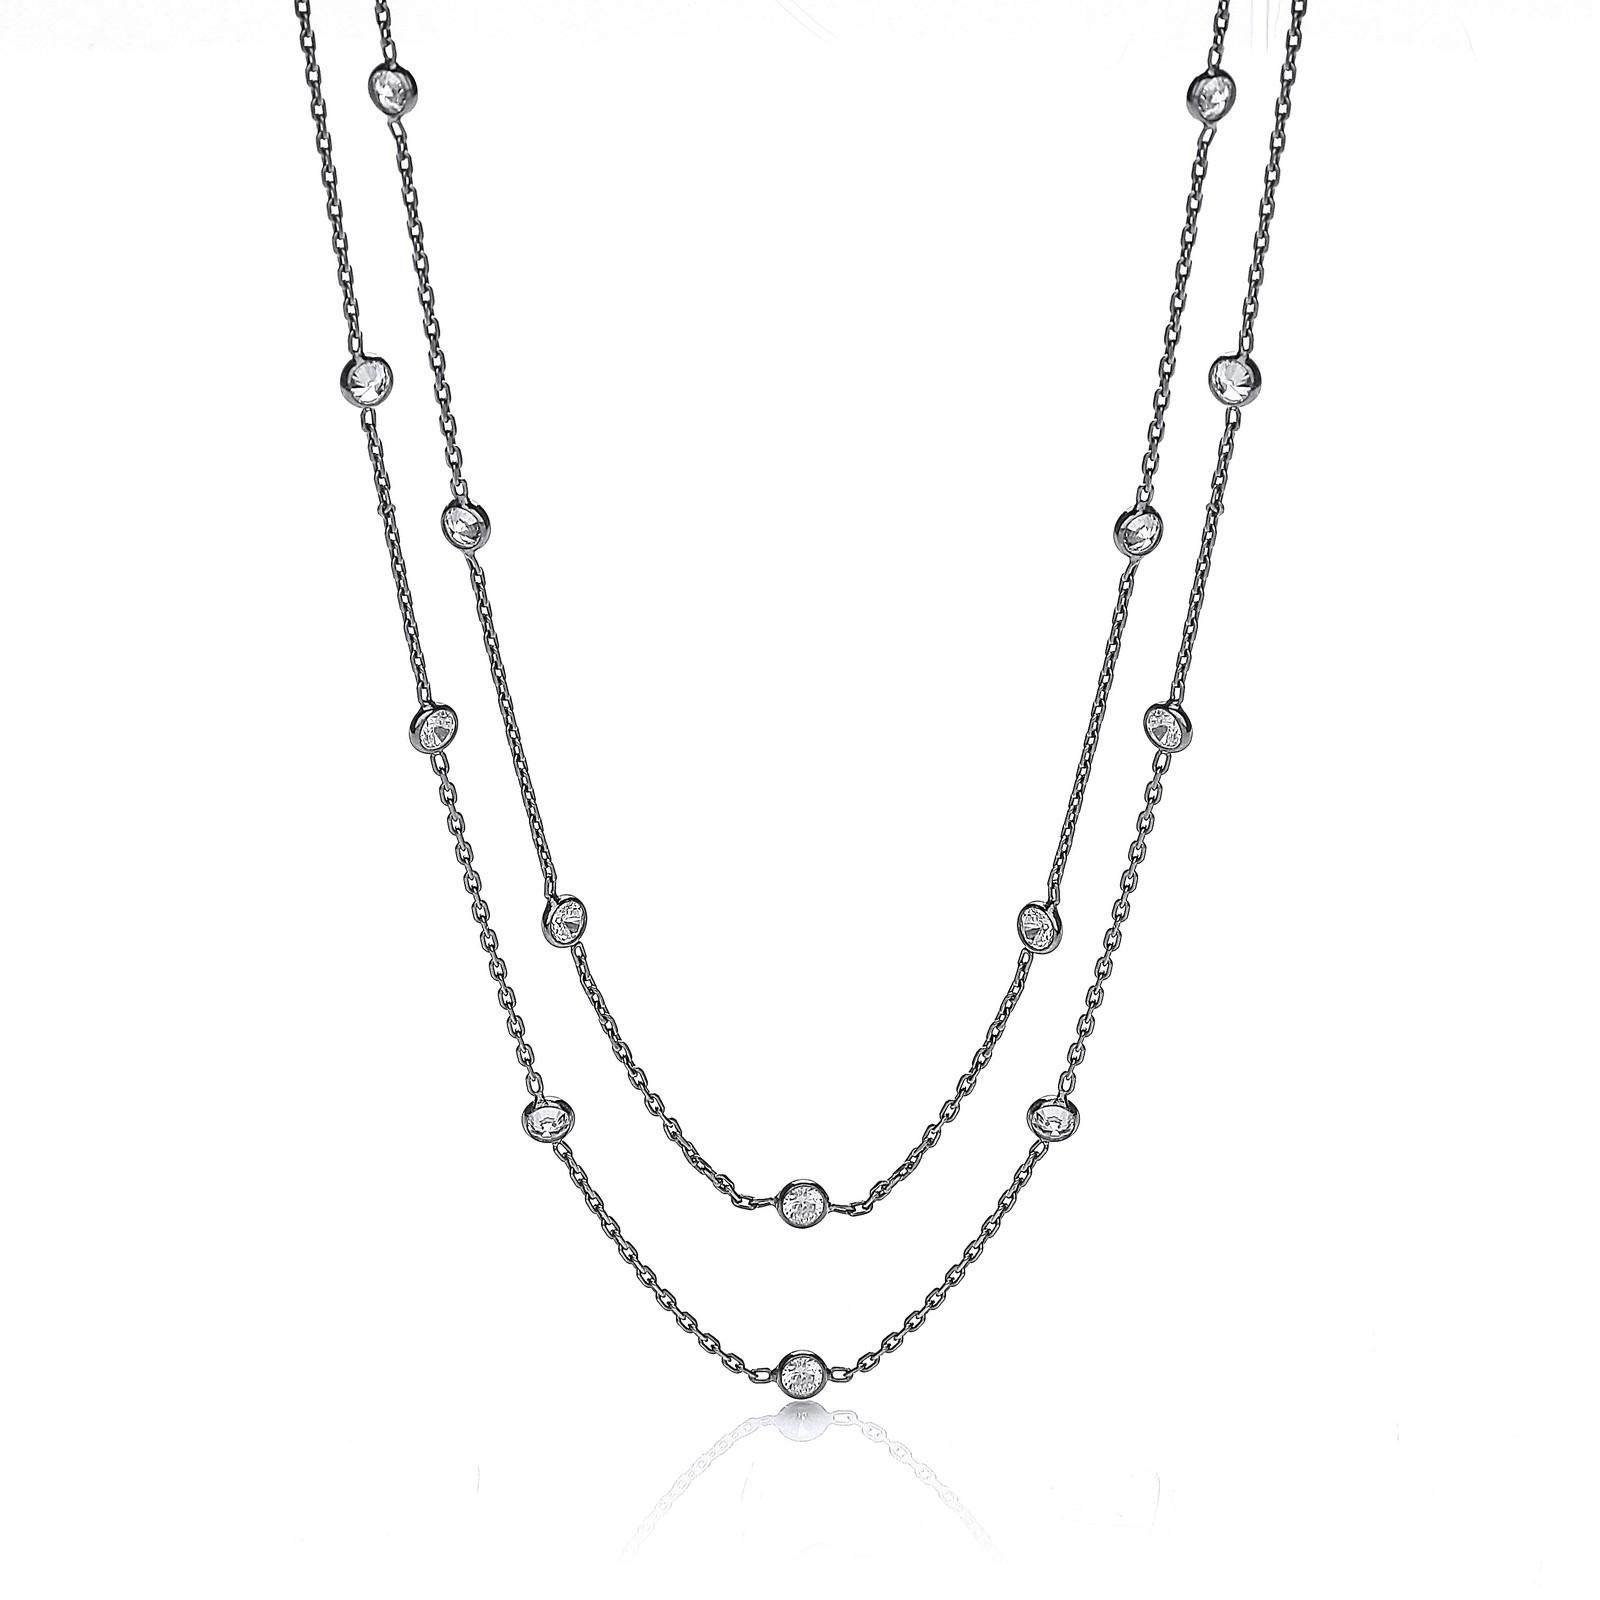 "Ruthenium Coated Rubover 23 Cz's Necklace 38"""